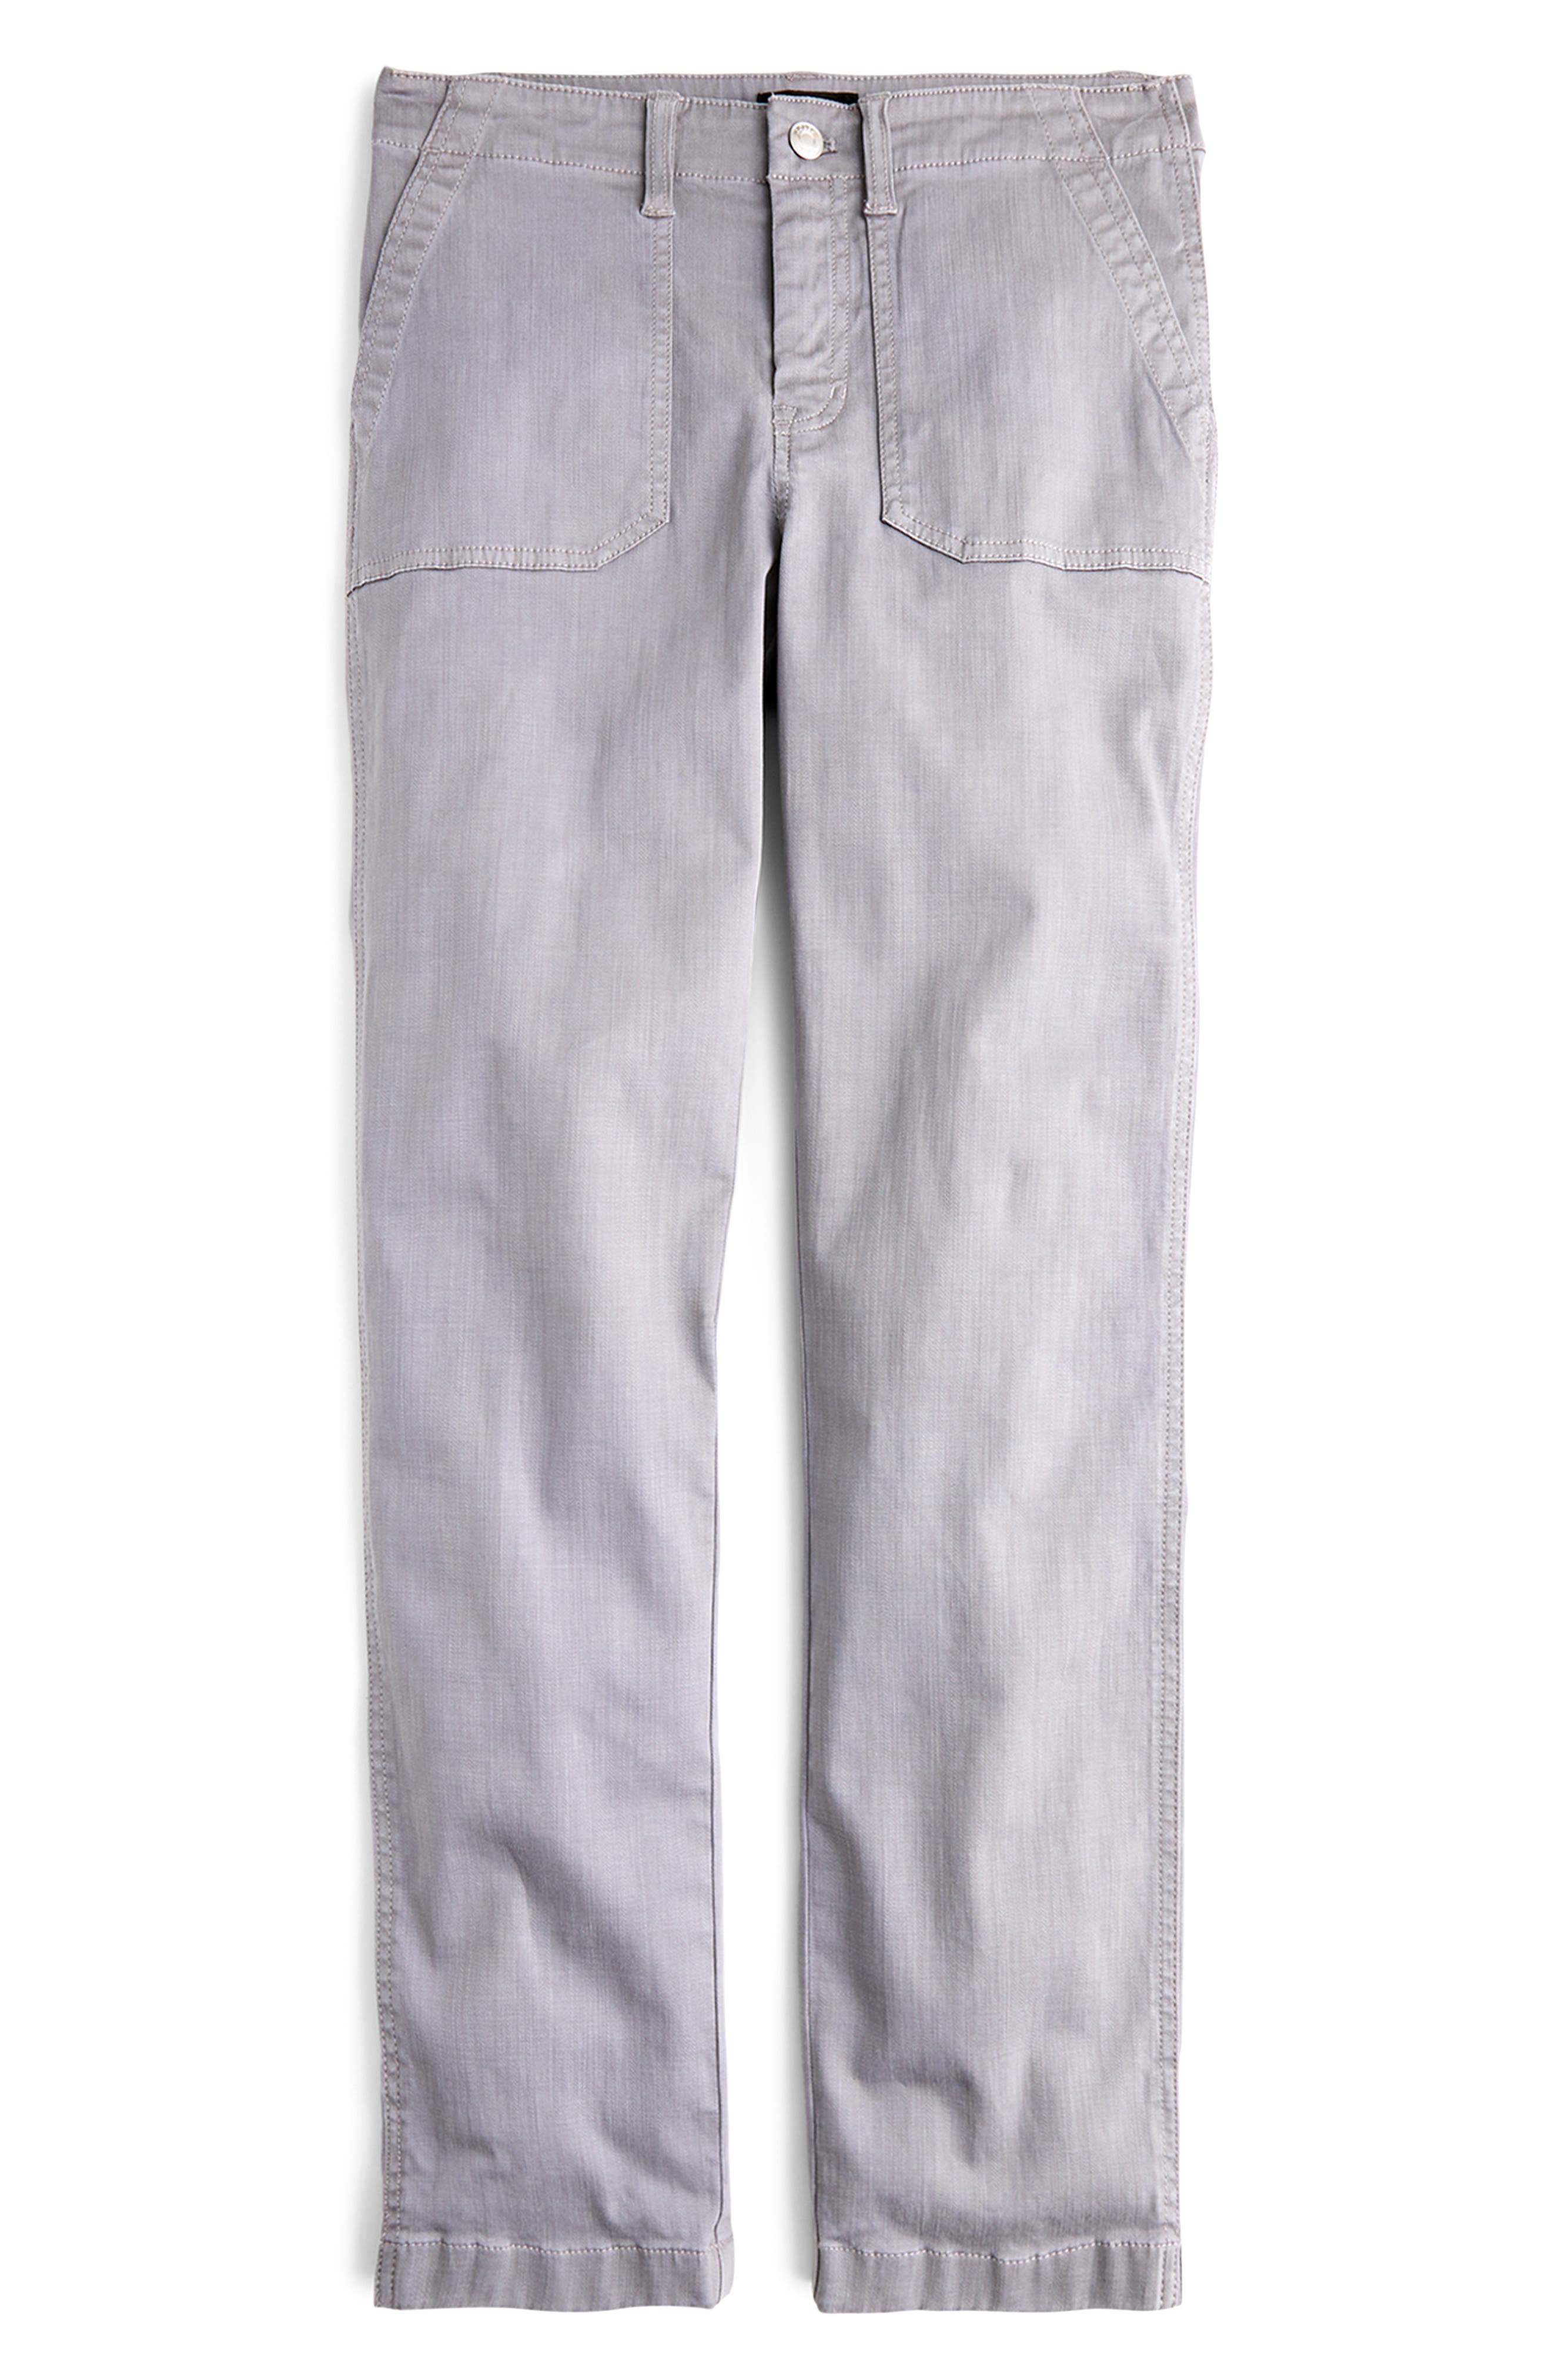 J.crew Slub Sateen Straight Leg Cargo Pants, 3 - Grey